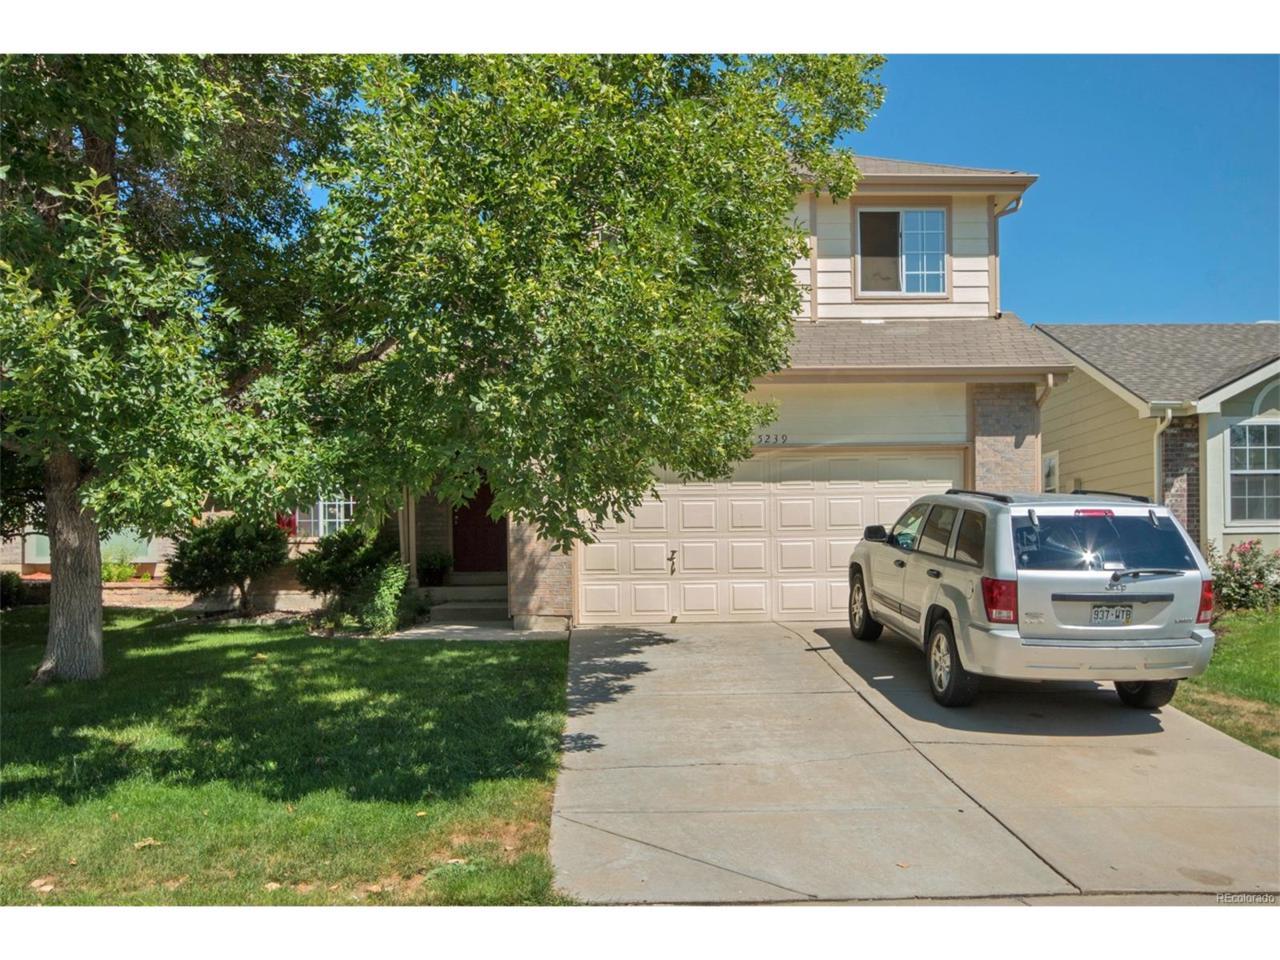 5239 E 127th Drive, Thornton, CO 80241 (MLS #6737871) :: 8z Real Estate